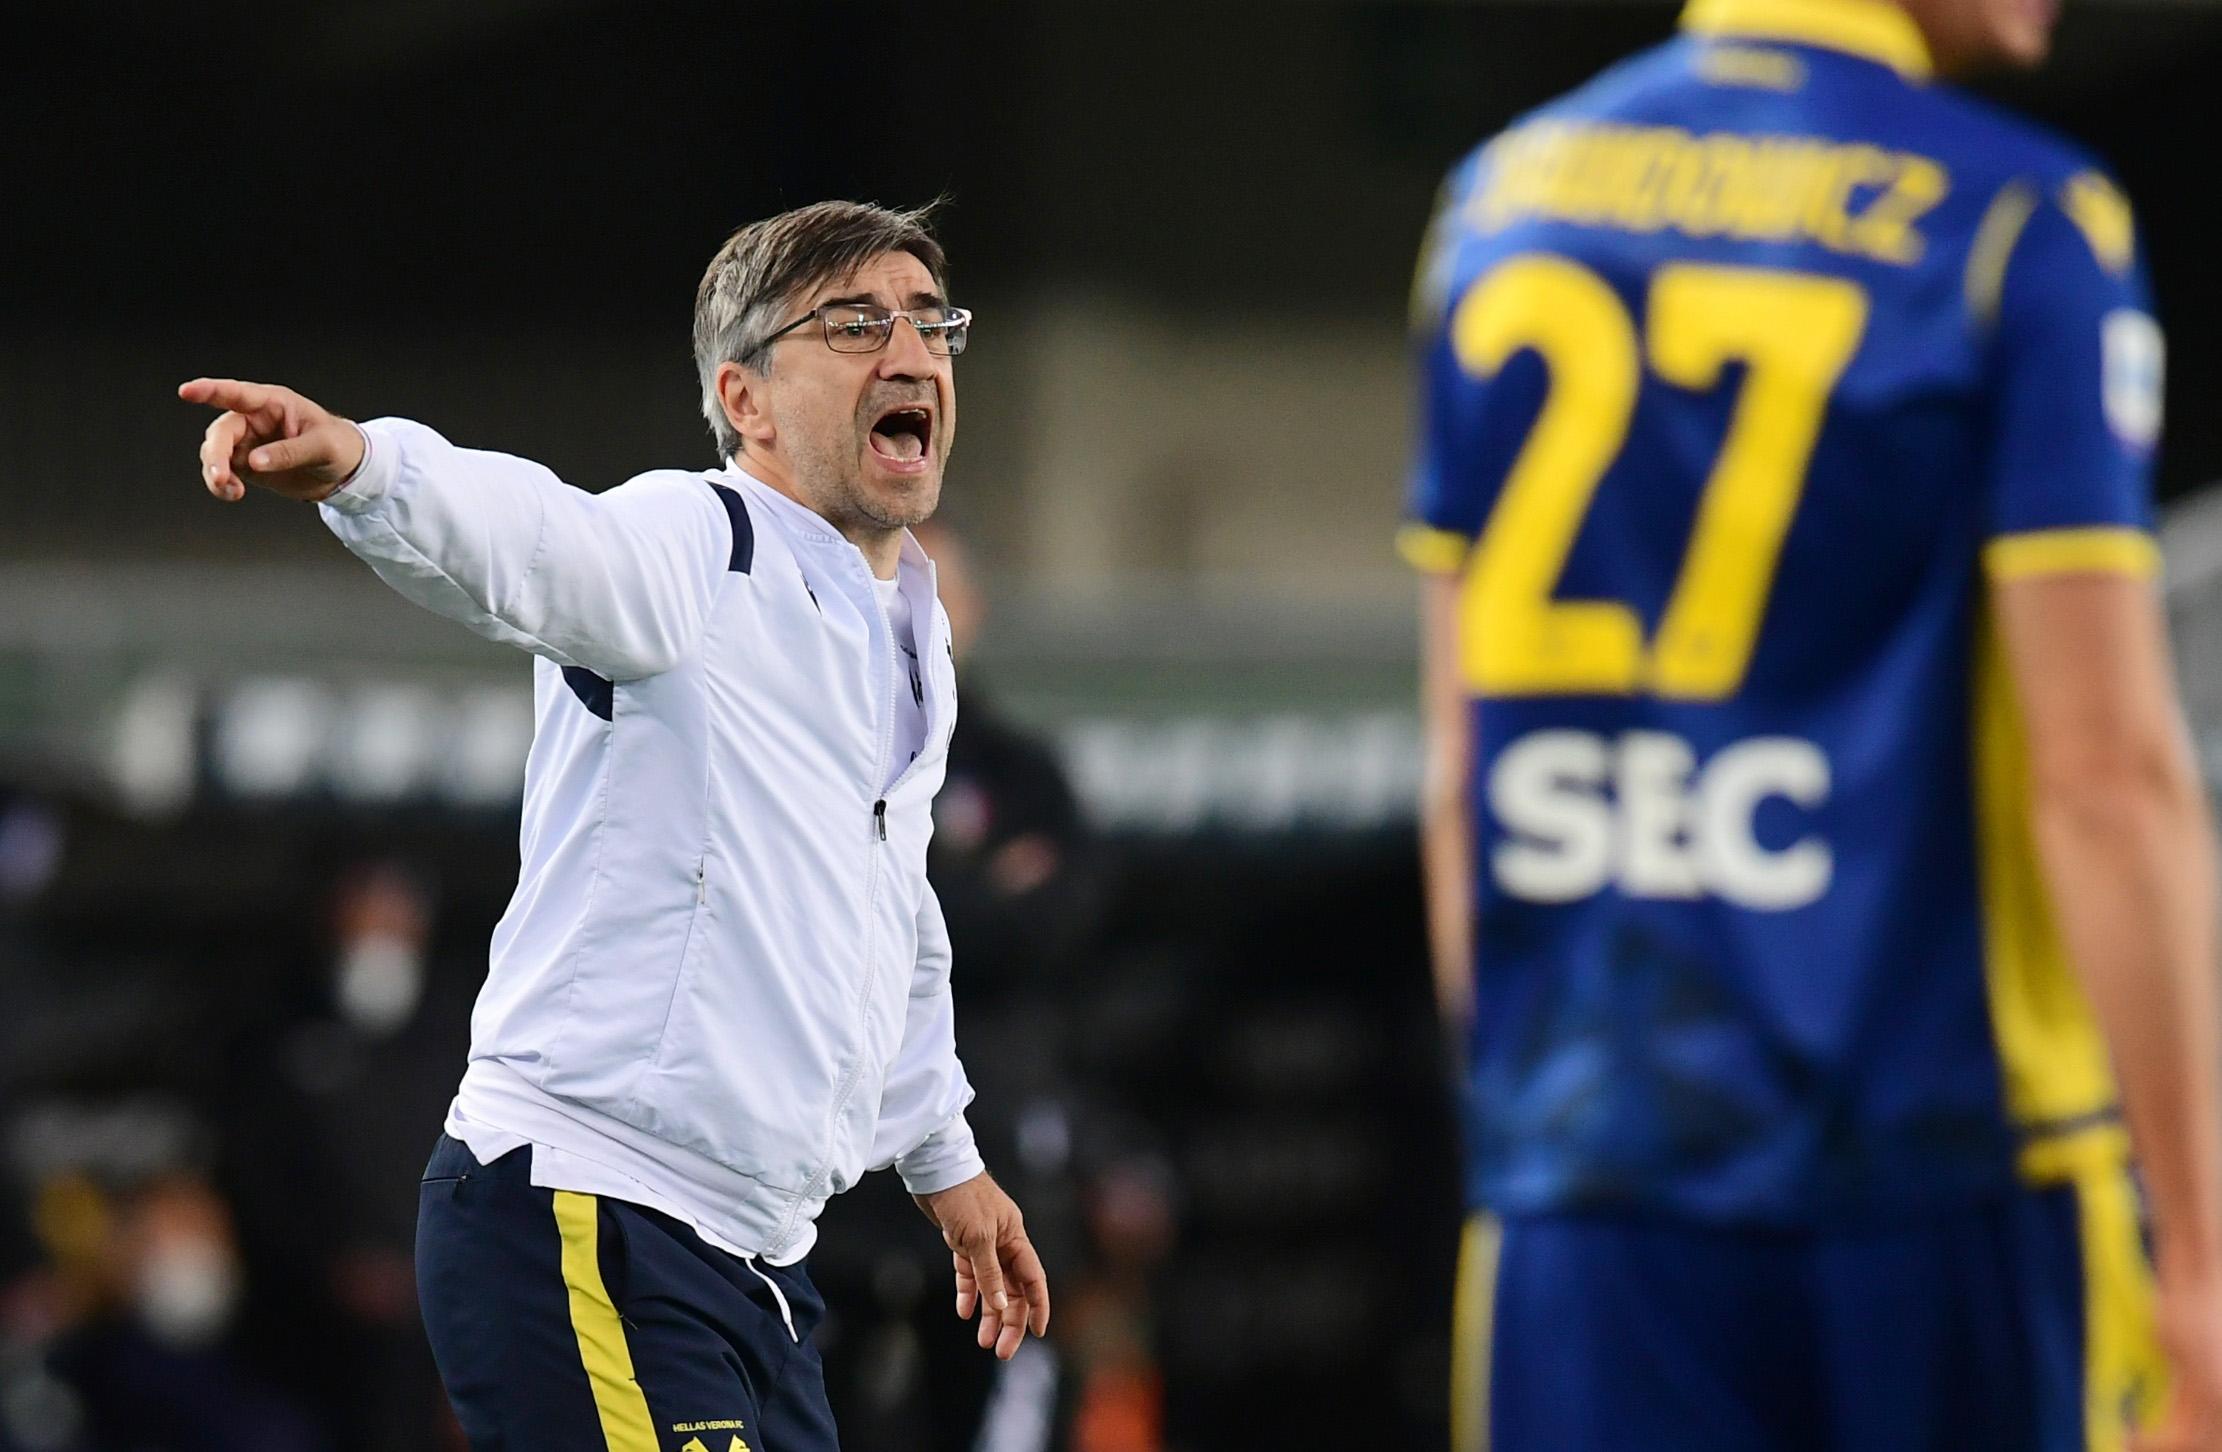 Trener Verone Ivan Jurić/Foto REUTERS